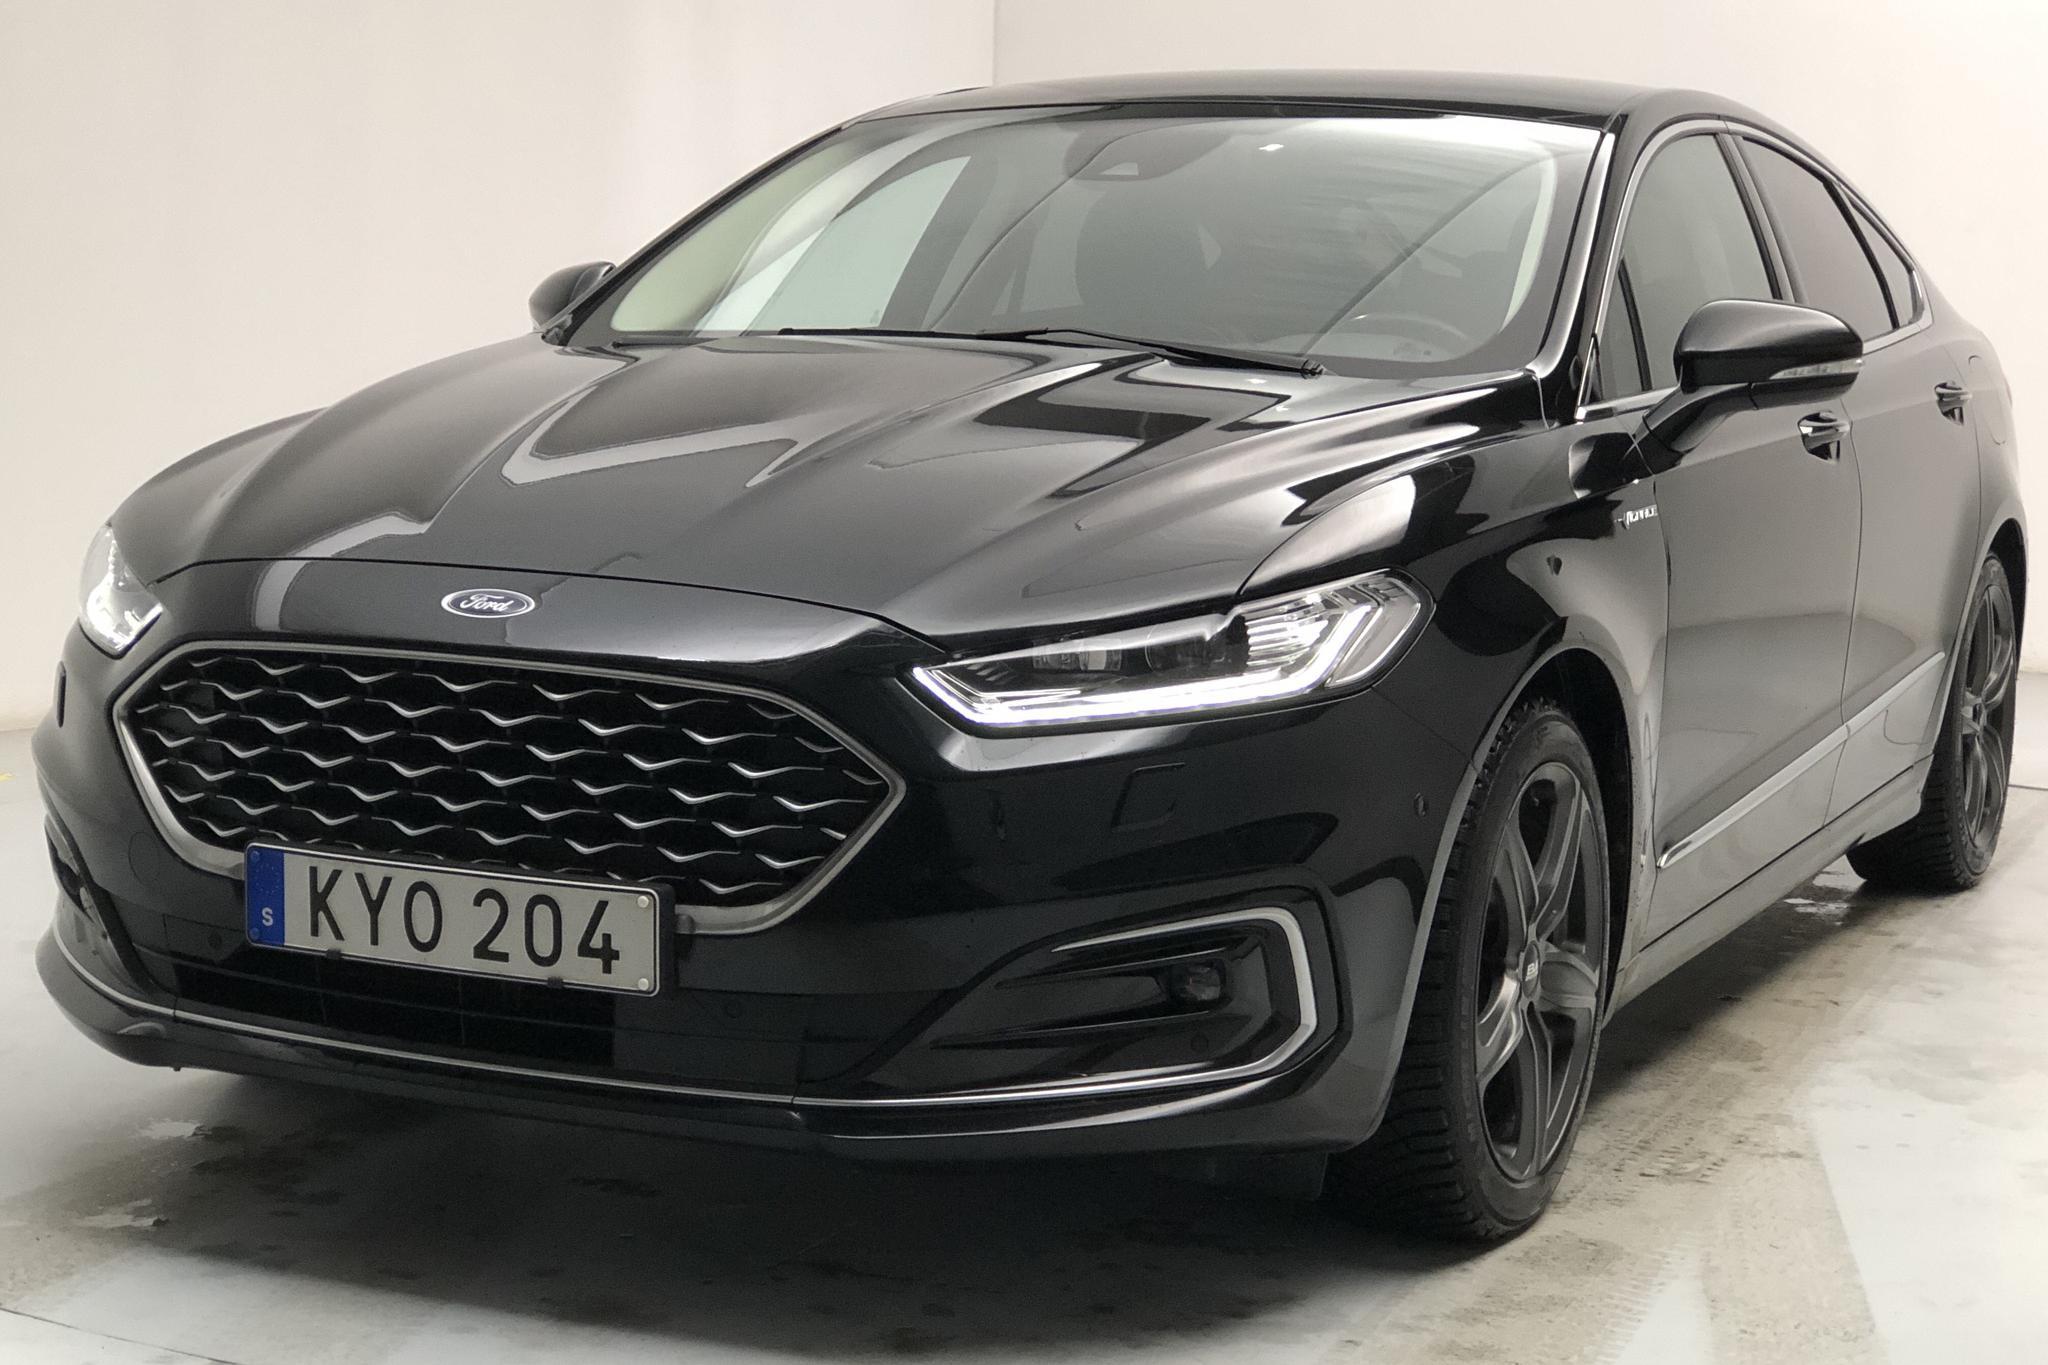 Ford Mondeo 2.0 TDCi 5dr (190hk) - 6 052 mil - Automat - svart - 2019